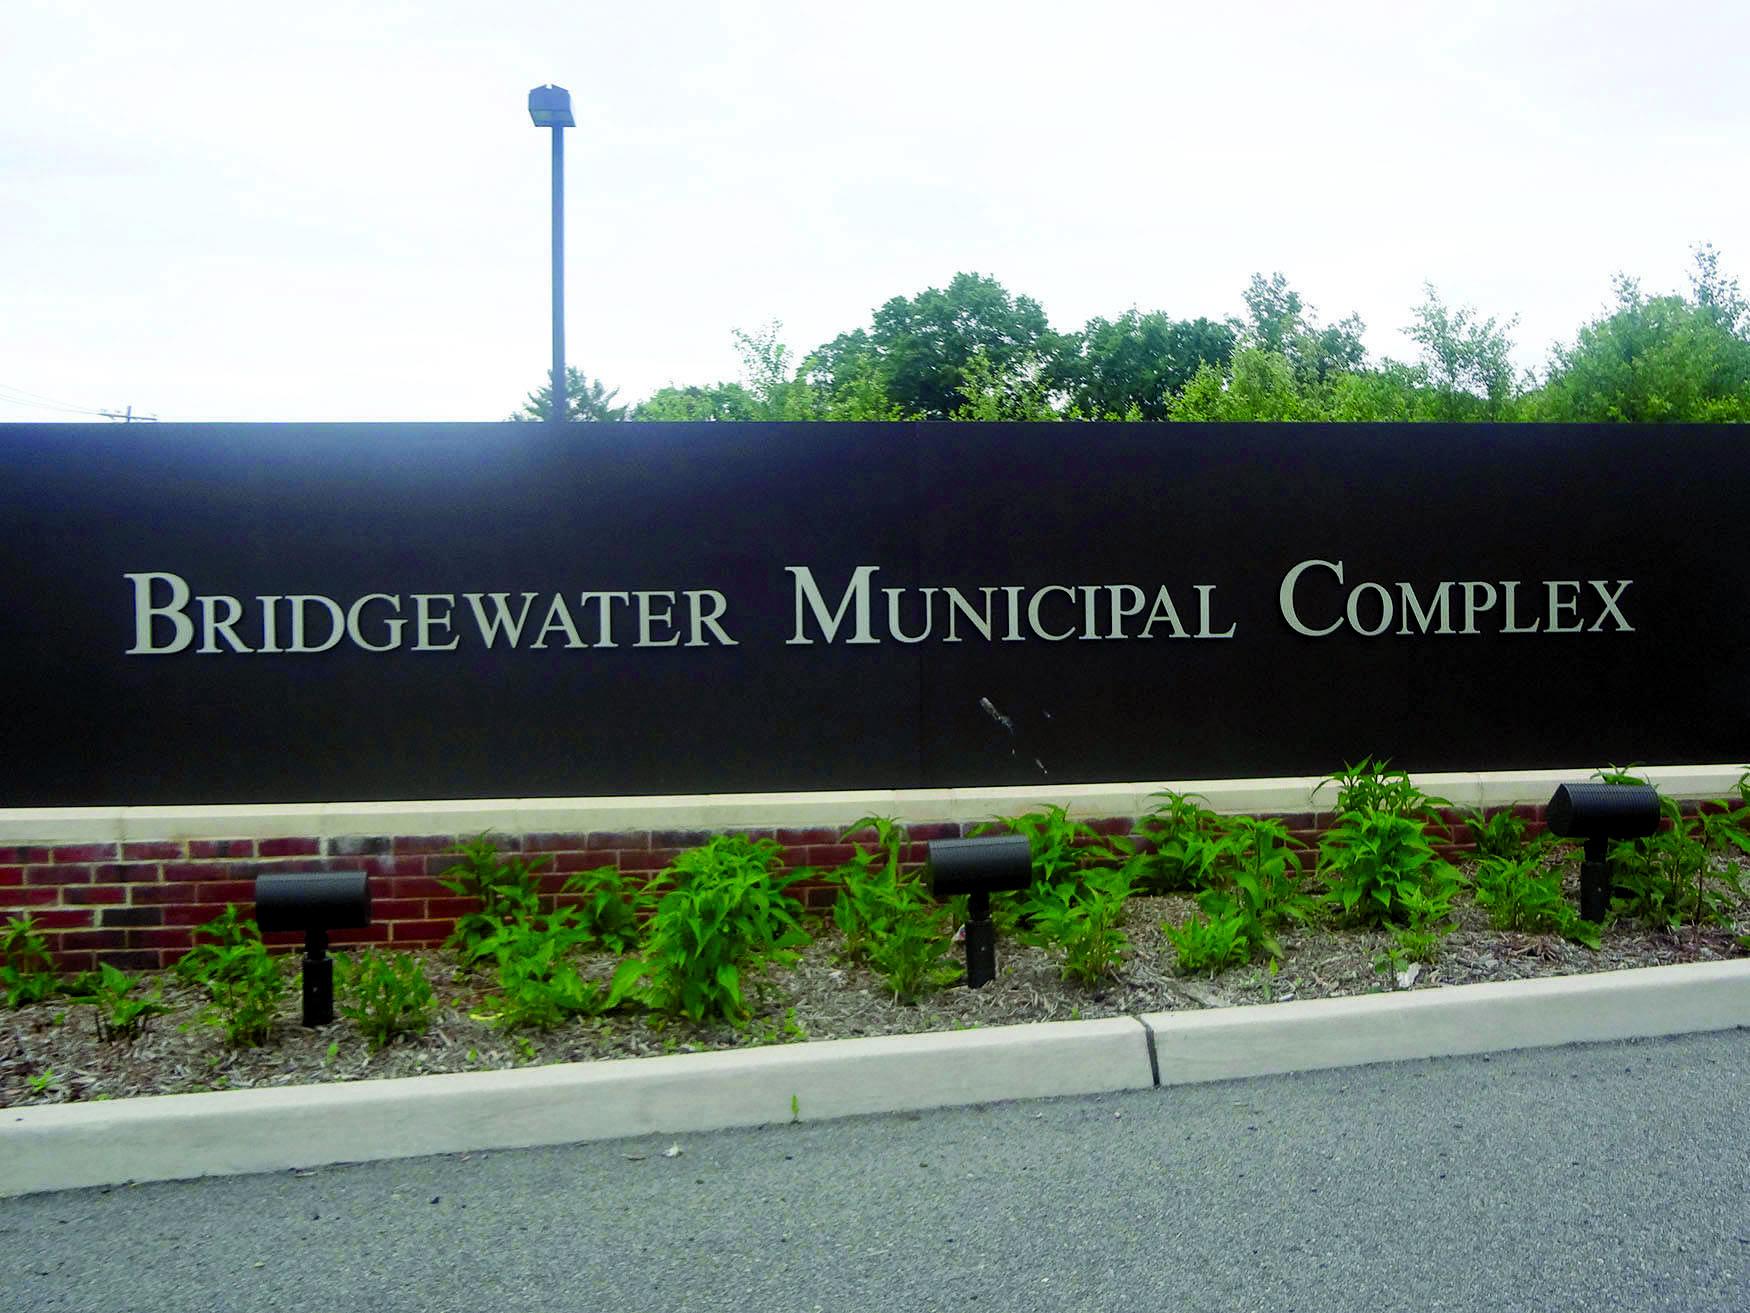 121219566fba2f6093e7_Bridgewater_municipal.jpg